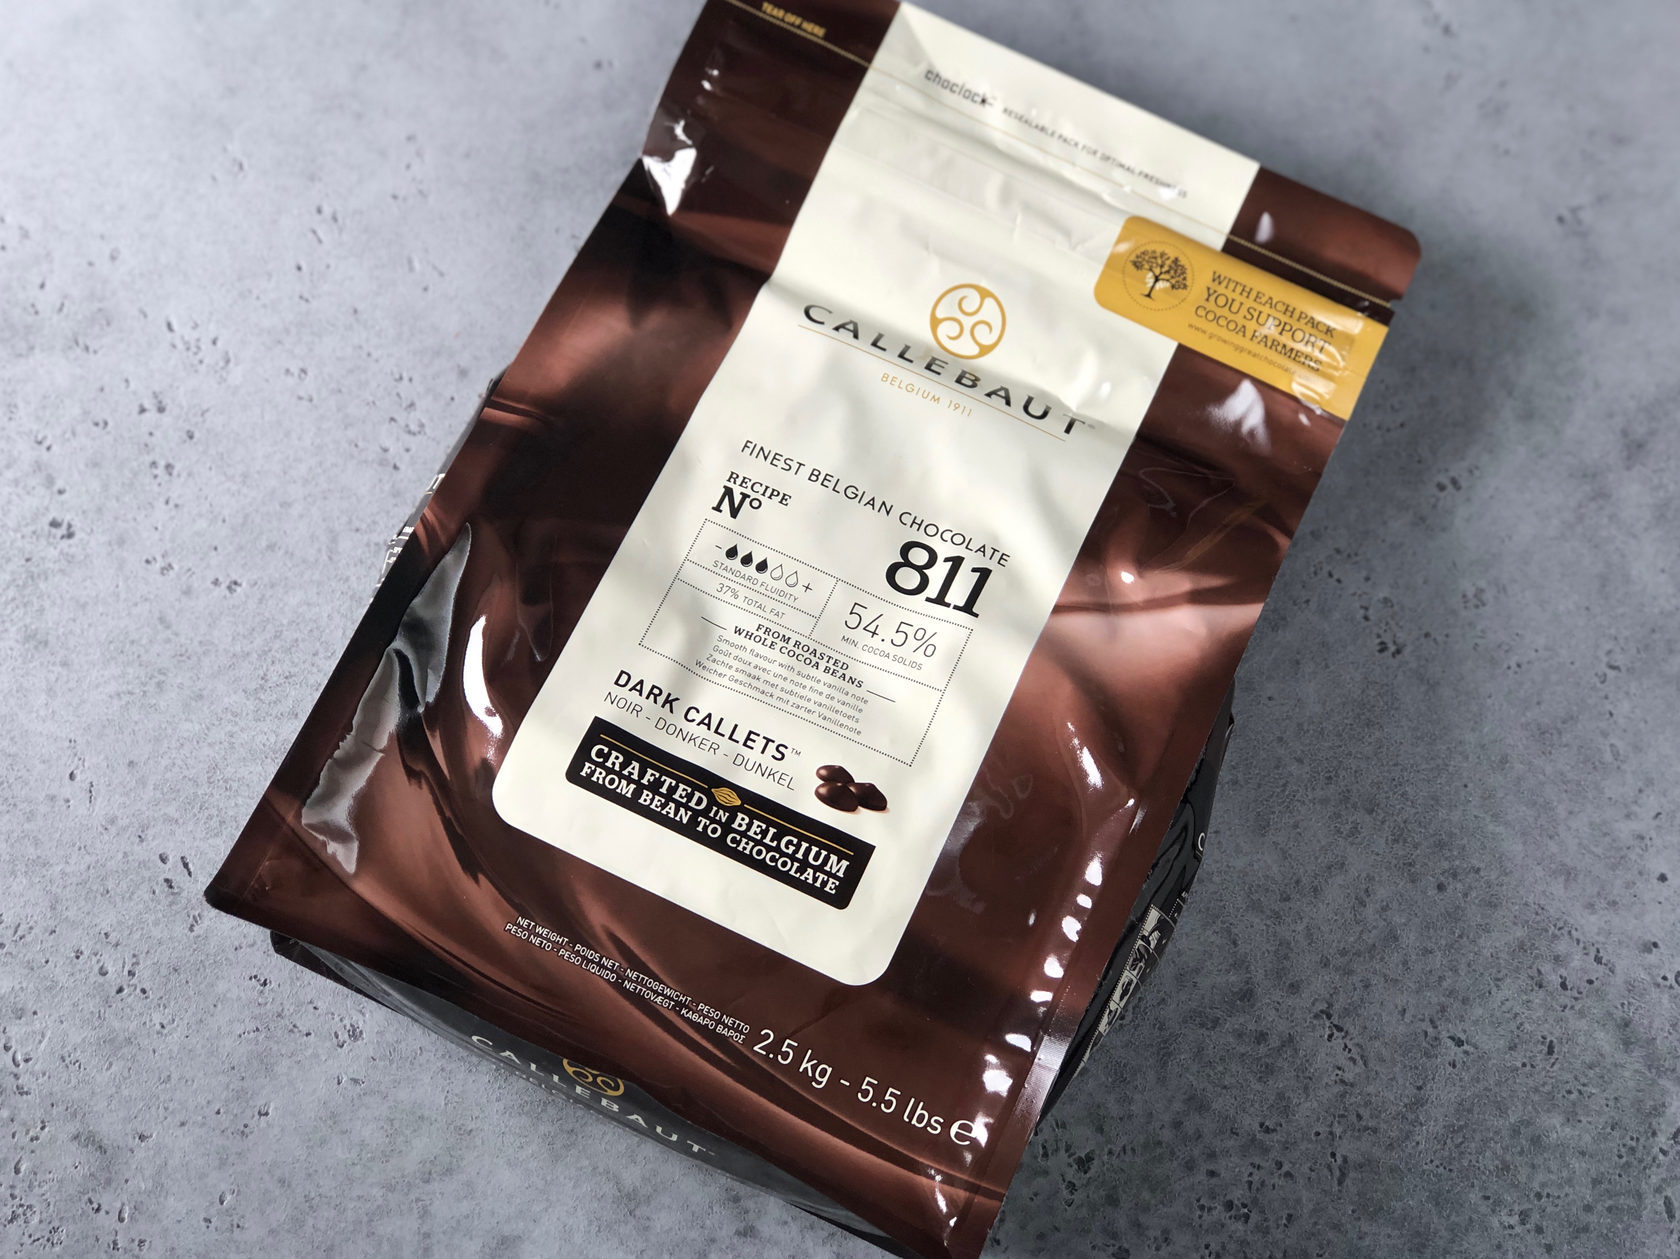 Шоколад тёмный Barry Callebaut 54,5%, 2,5 кг